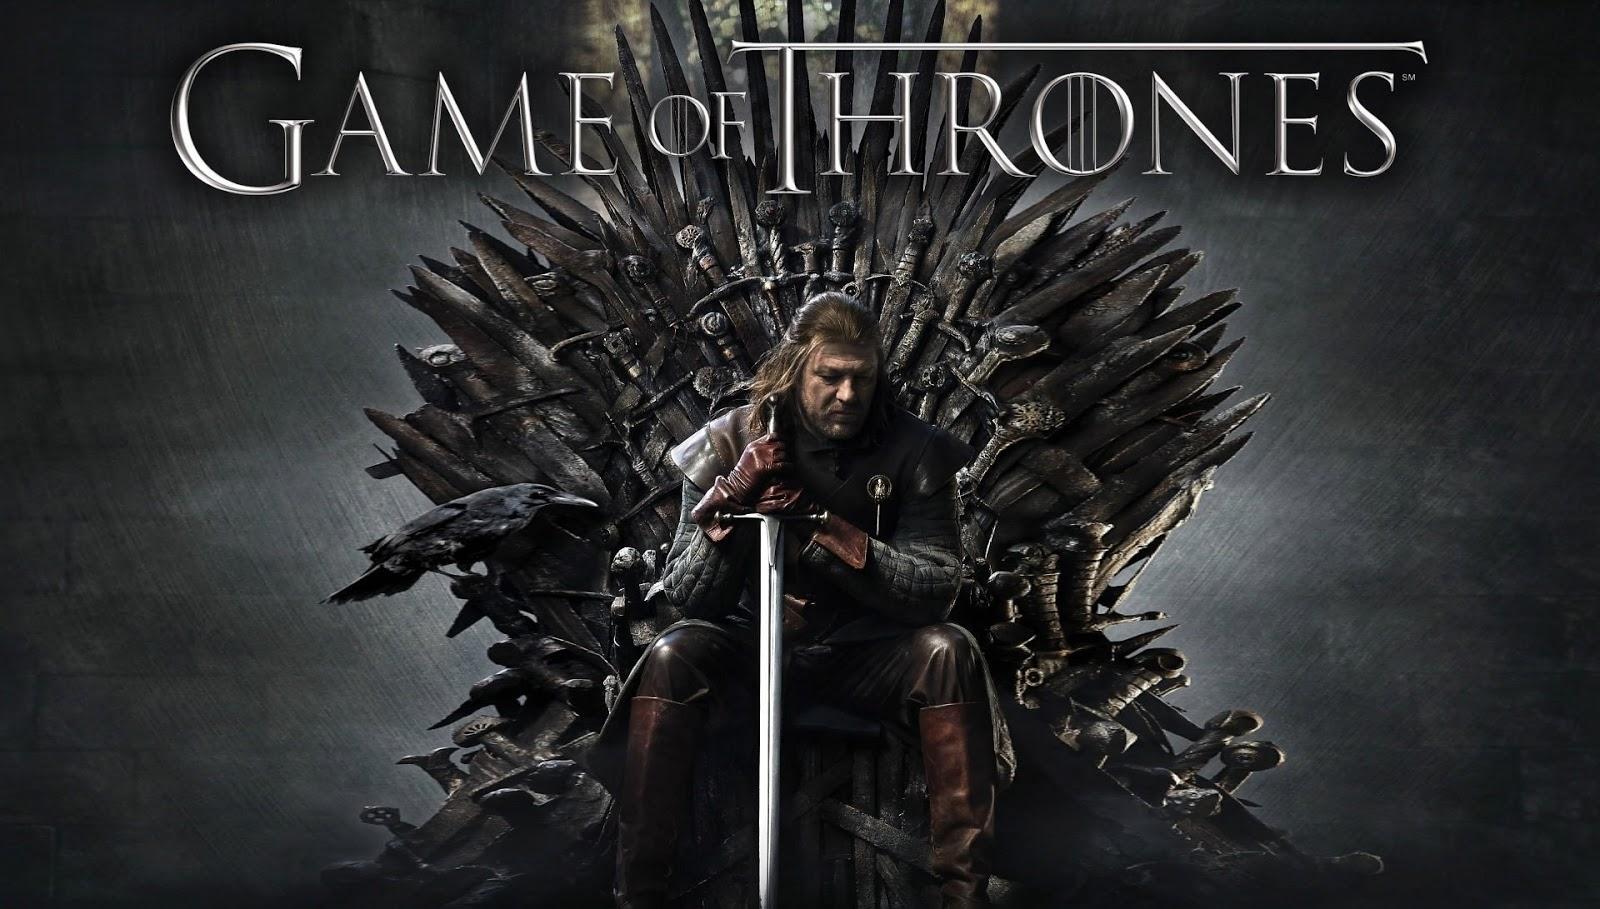 Game of thrones download telegram channel. telegram get messages channel.